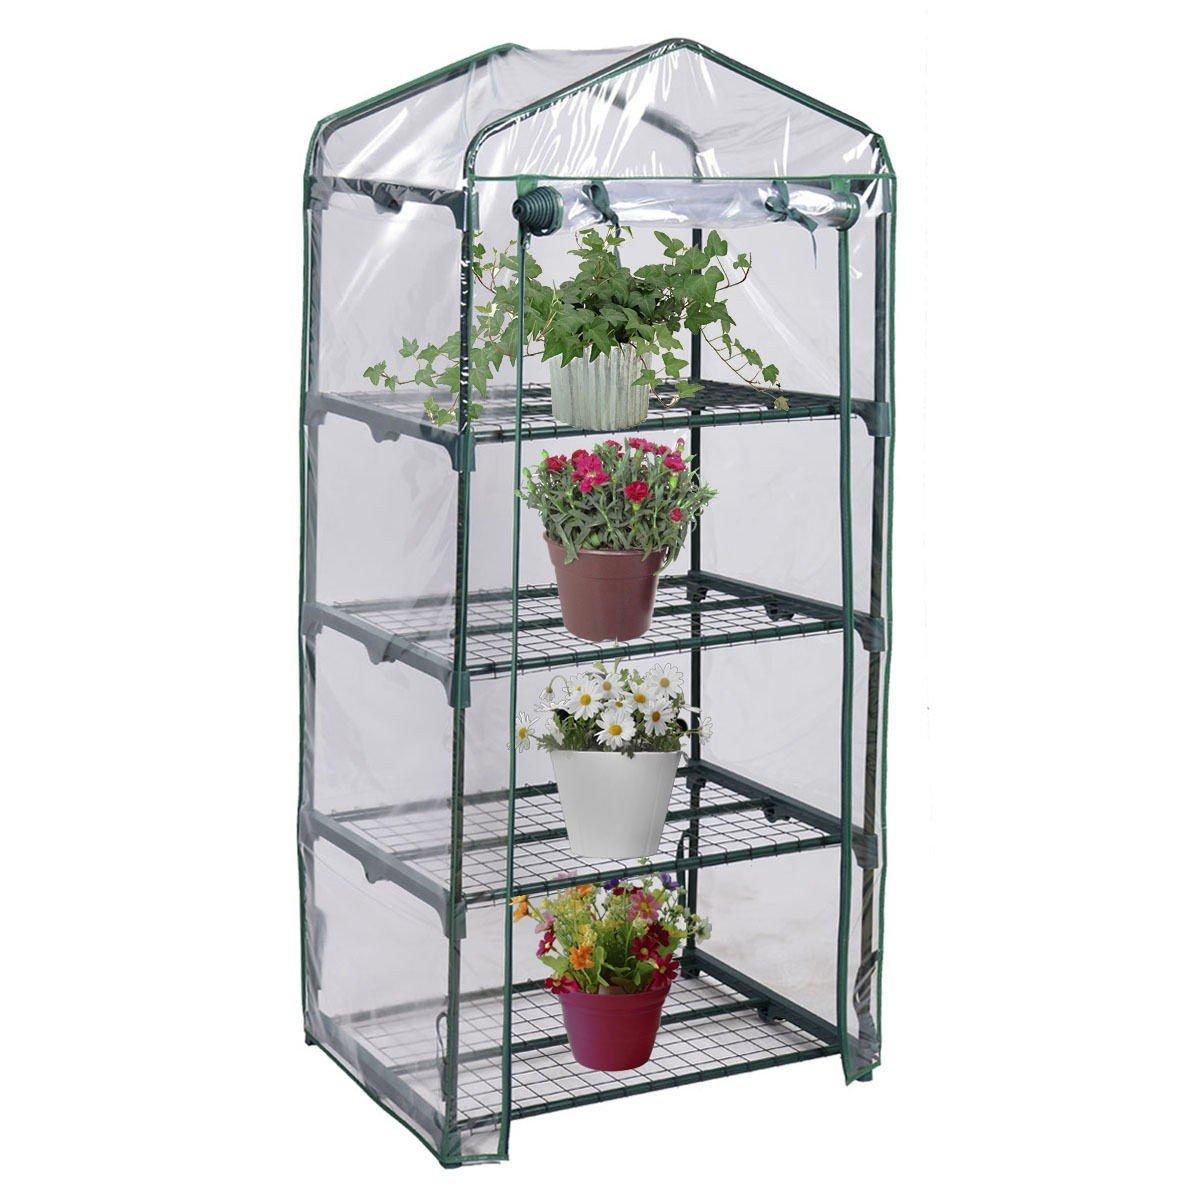 MRT SUPPLY Outdoor Portable Mini 4 Shelves Greenhouse Ebook